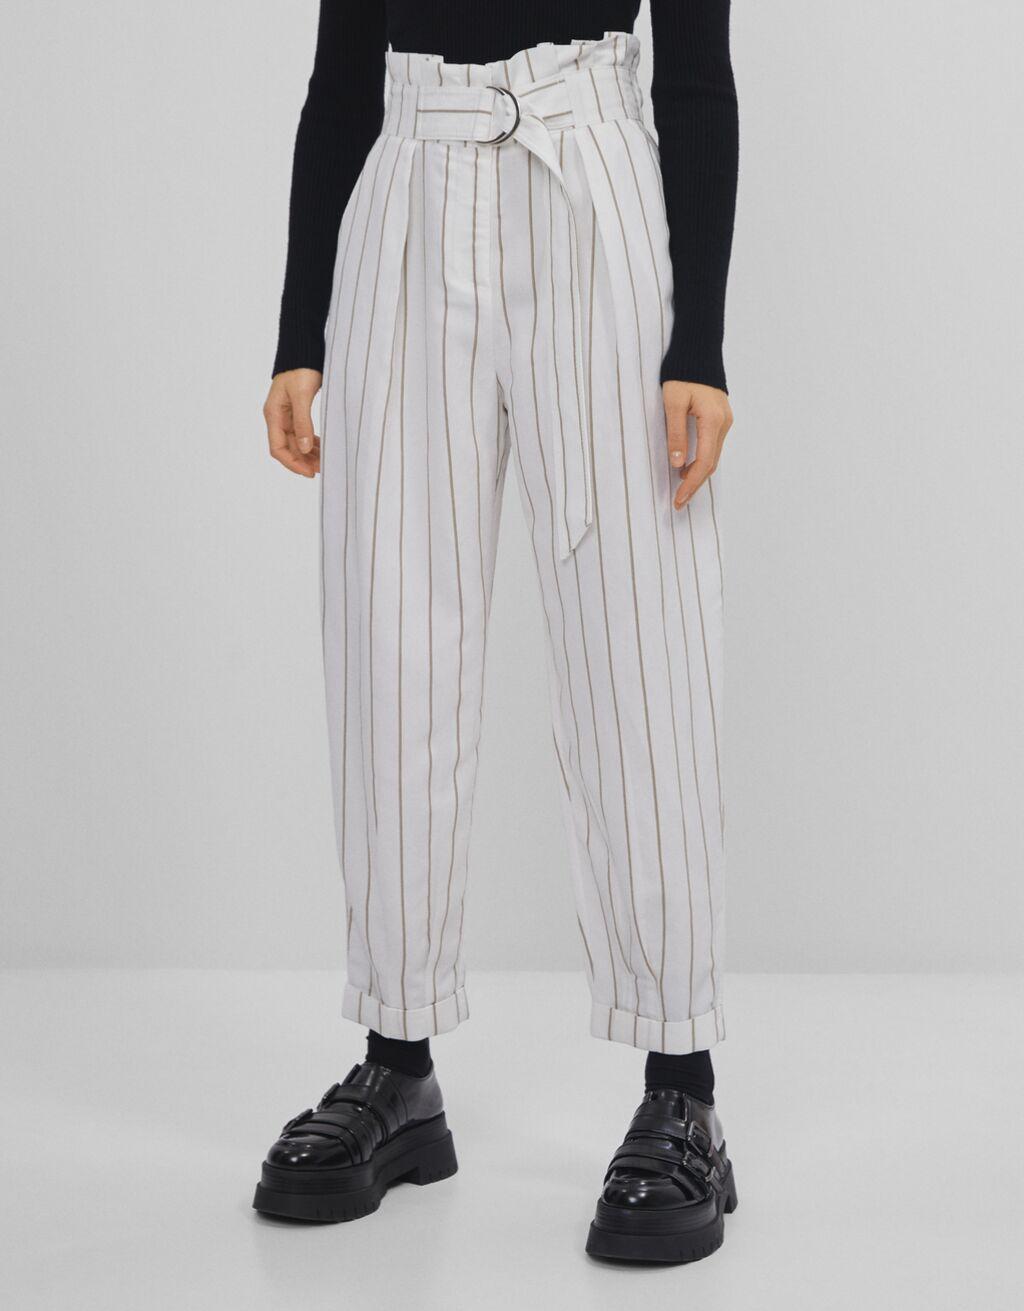 Pantaloni slouchy con cintura